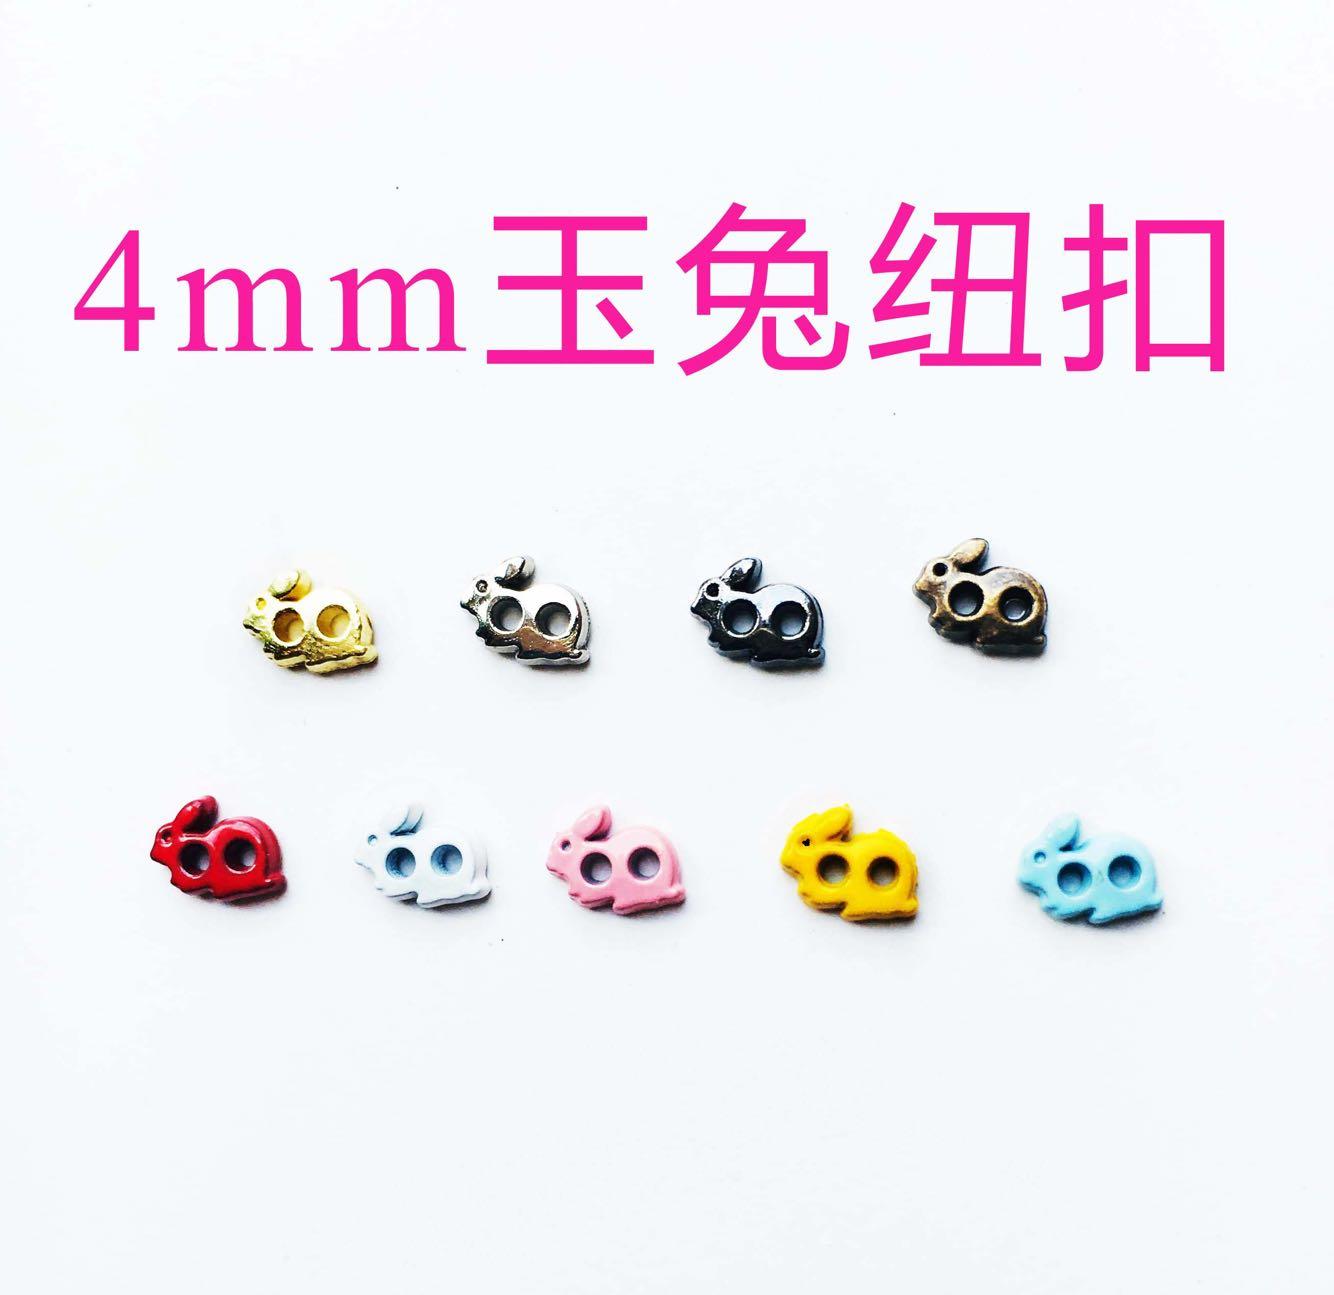 4mm super small mini button BJD small cloth doll clothes button handmade toy accessories rabbit